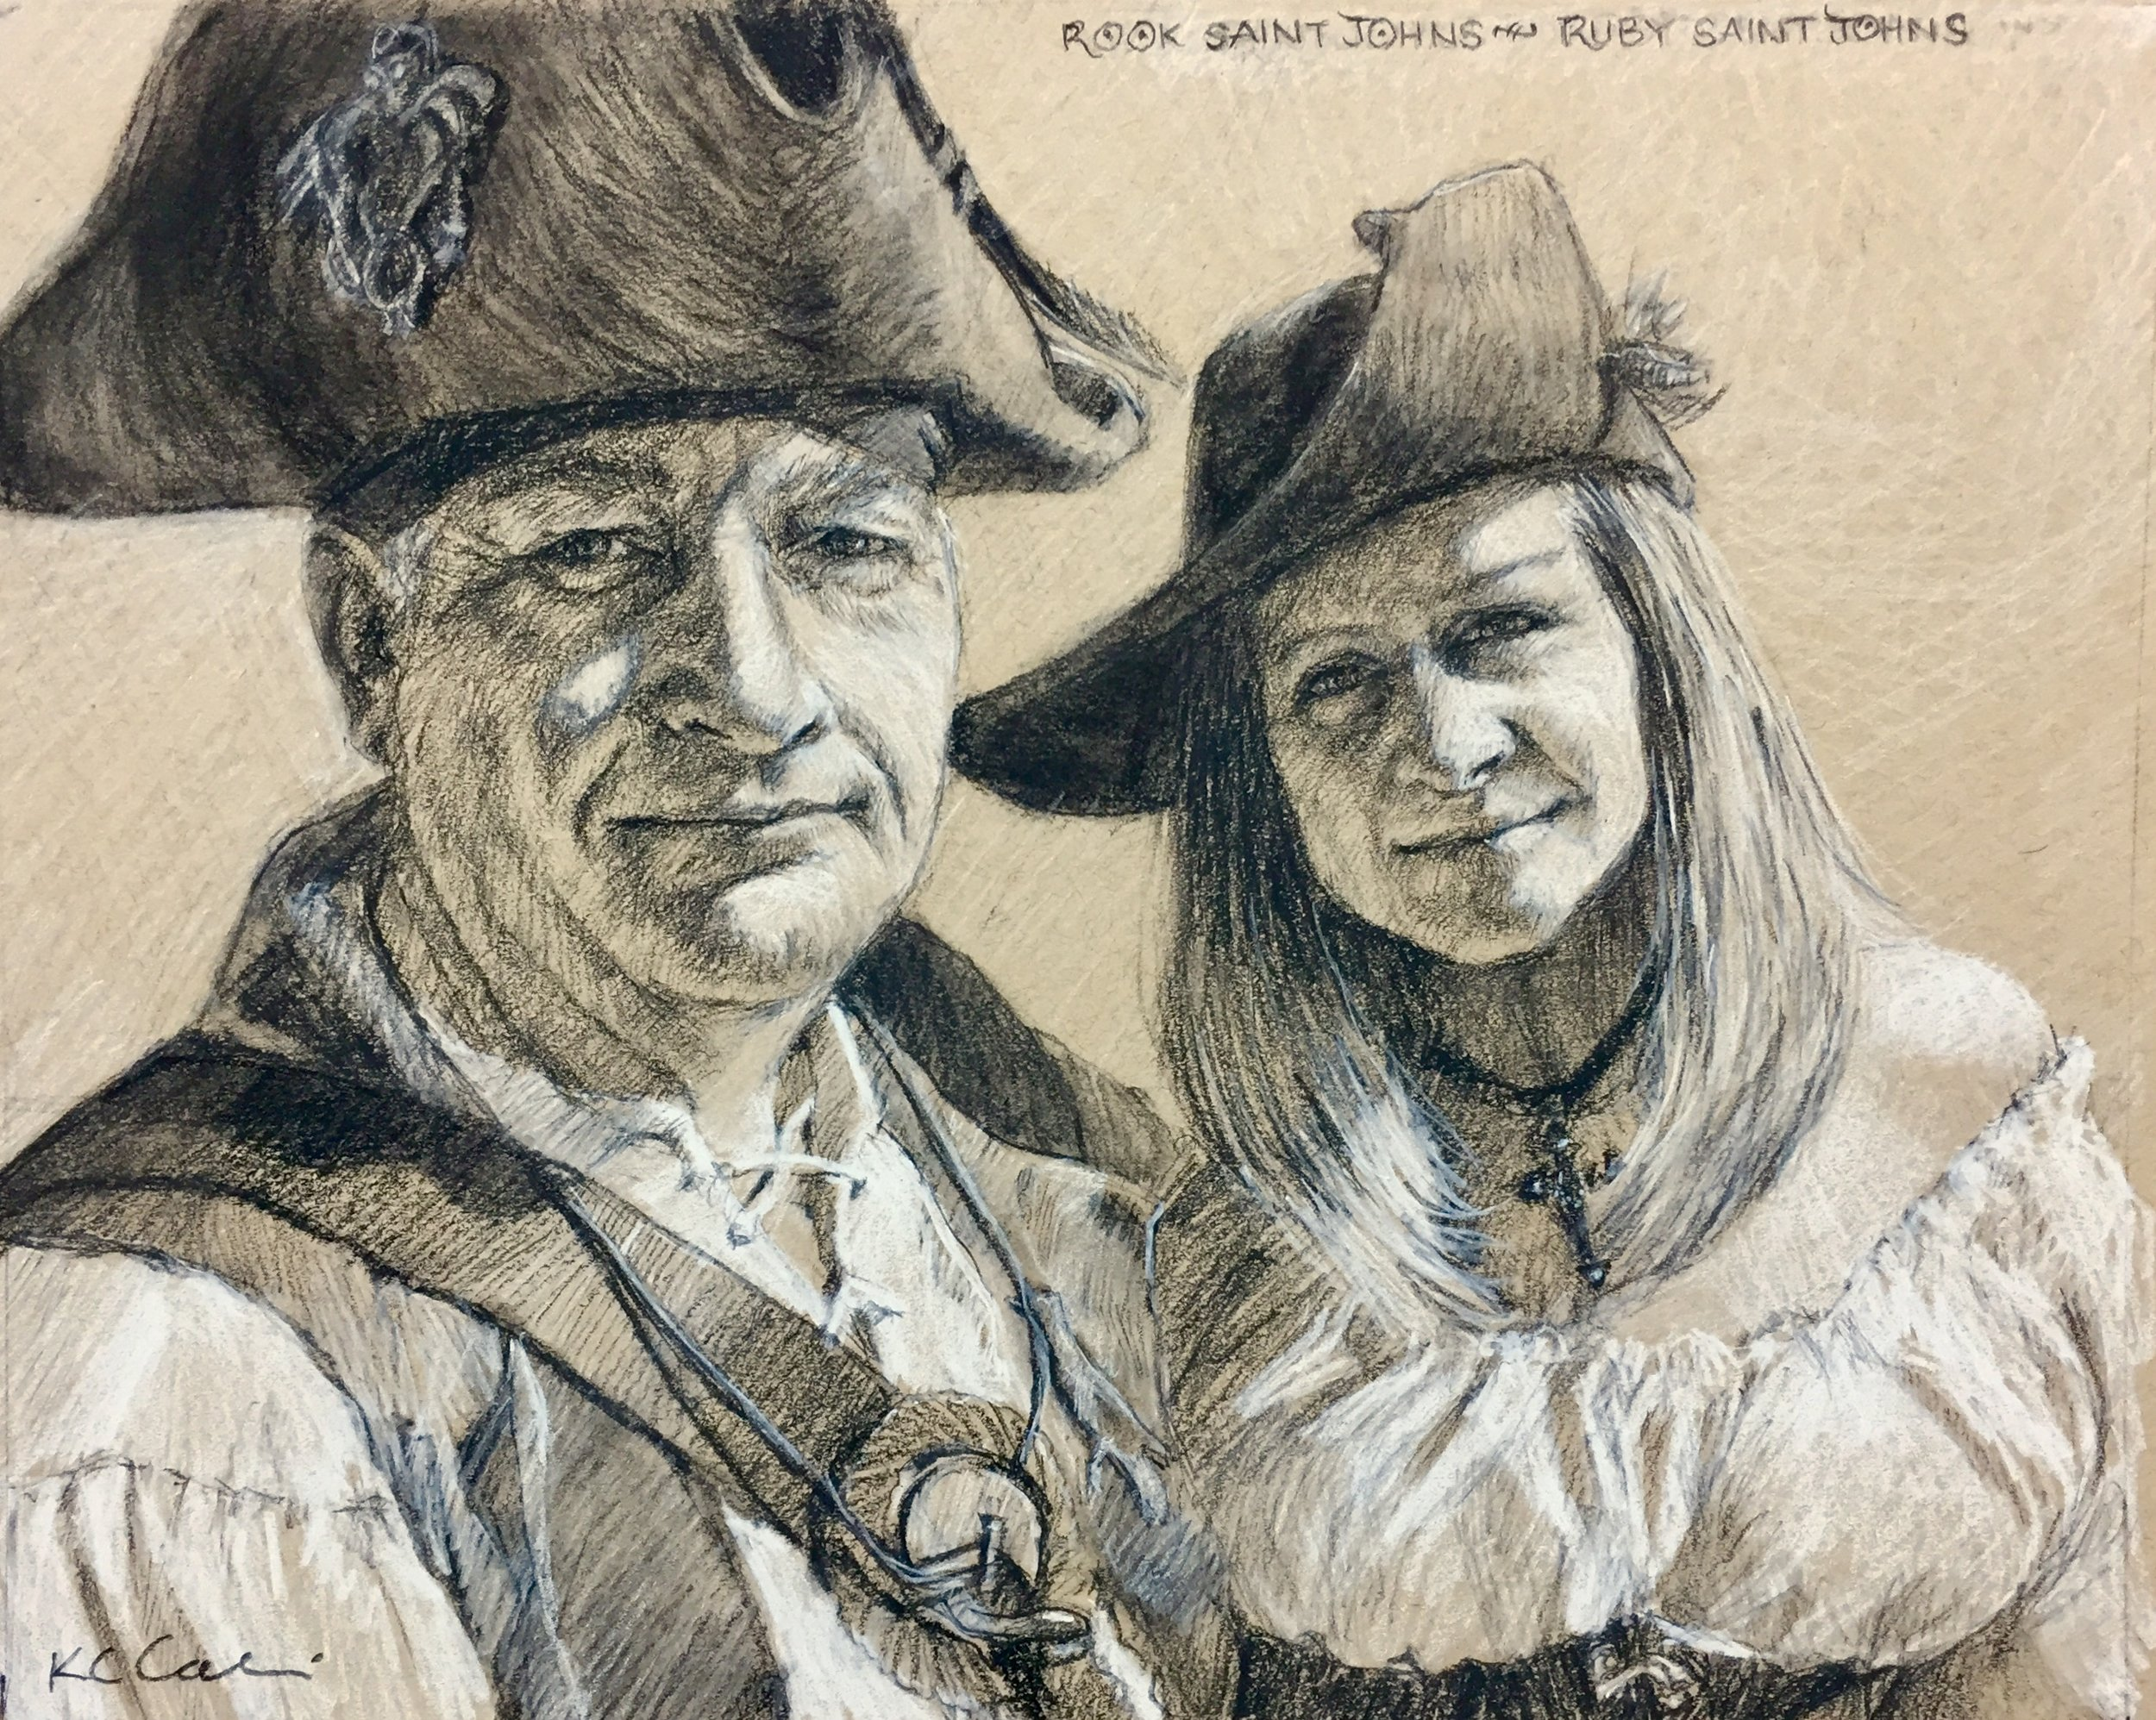 Jack & Ruby    [sold]